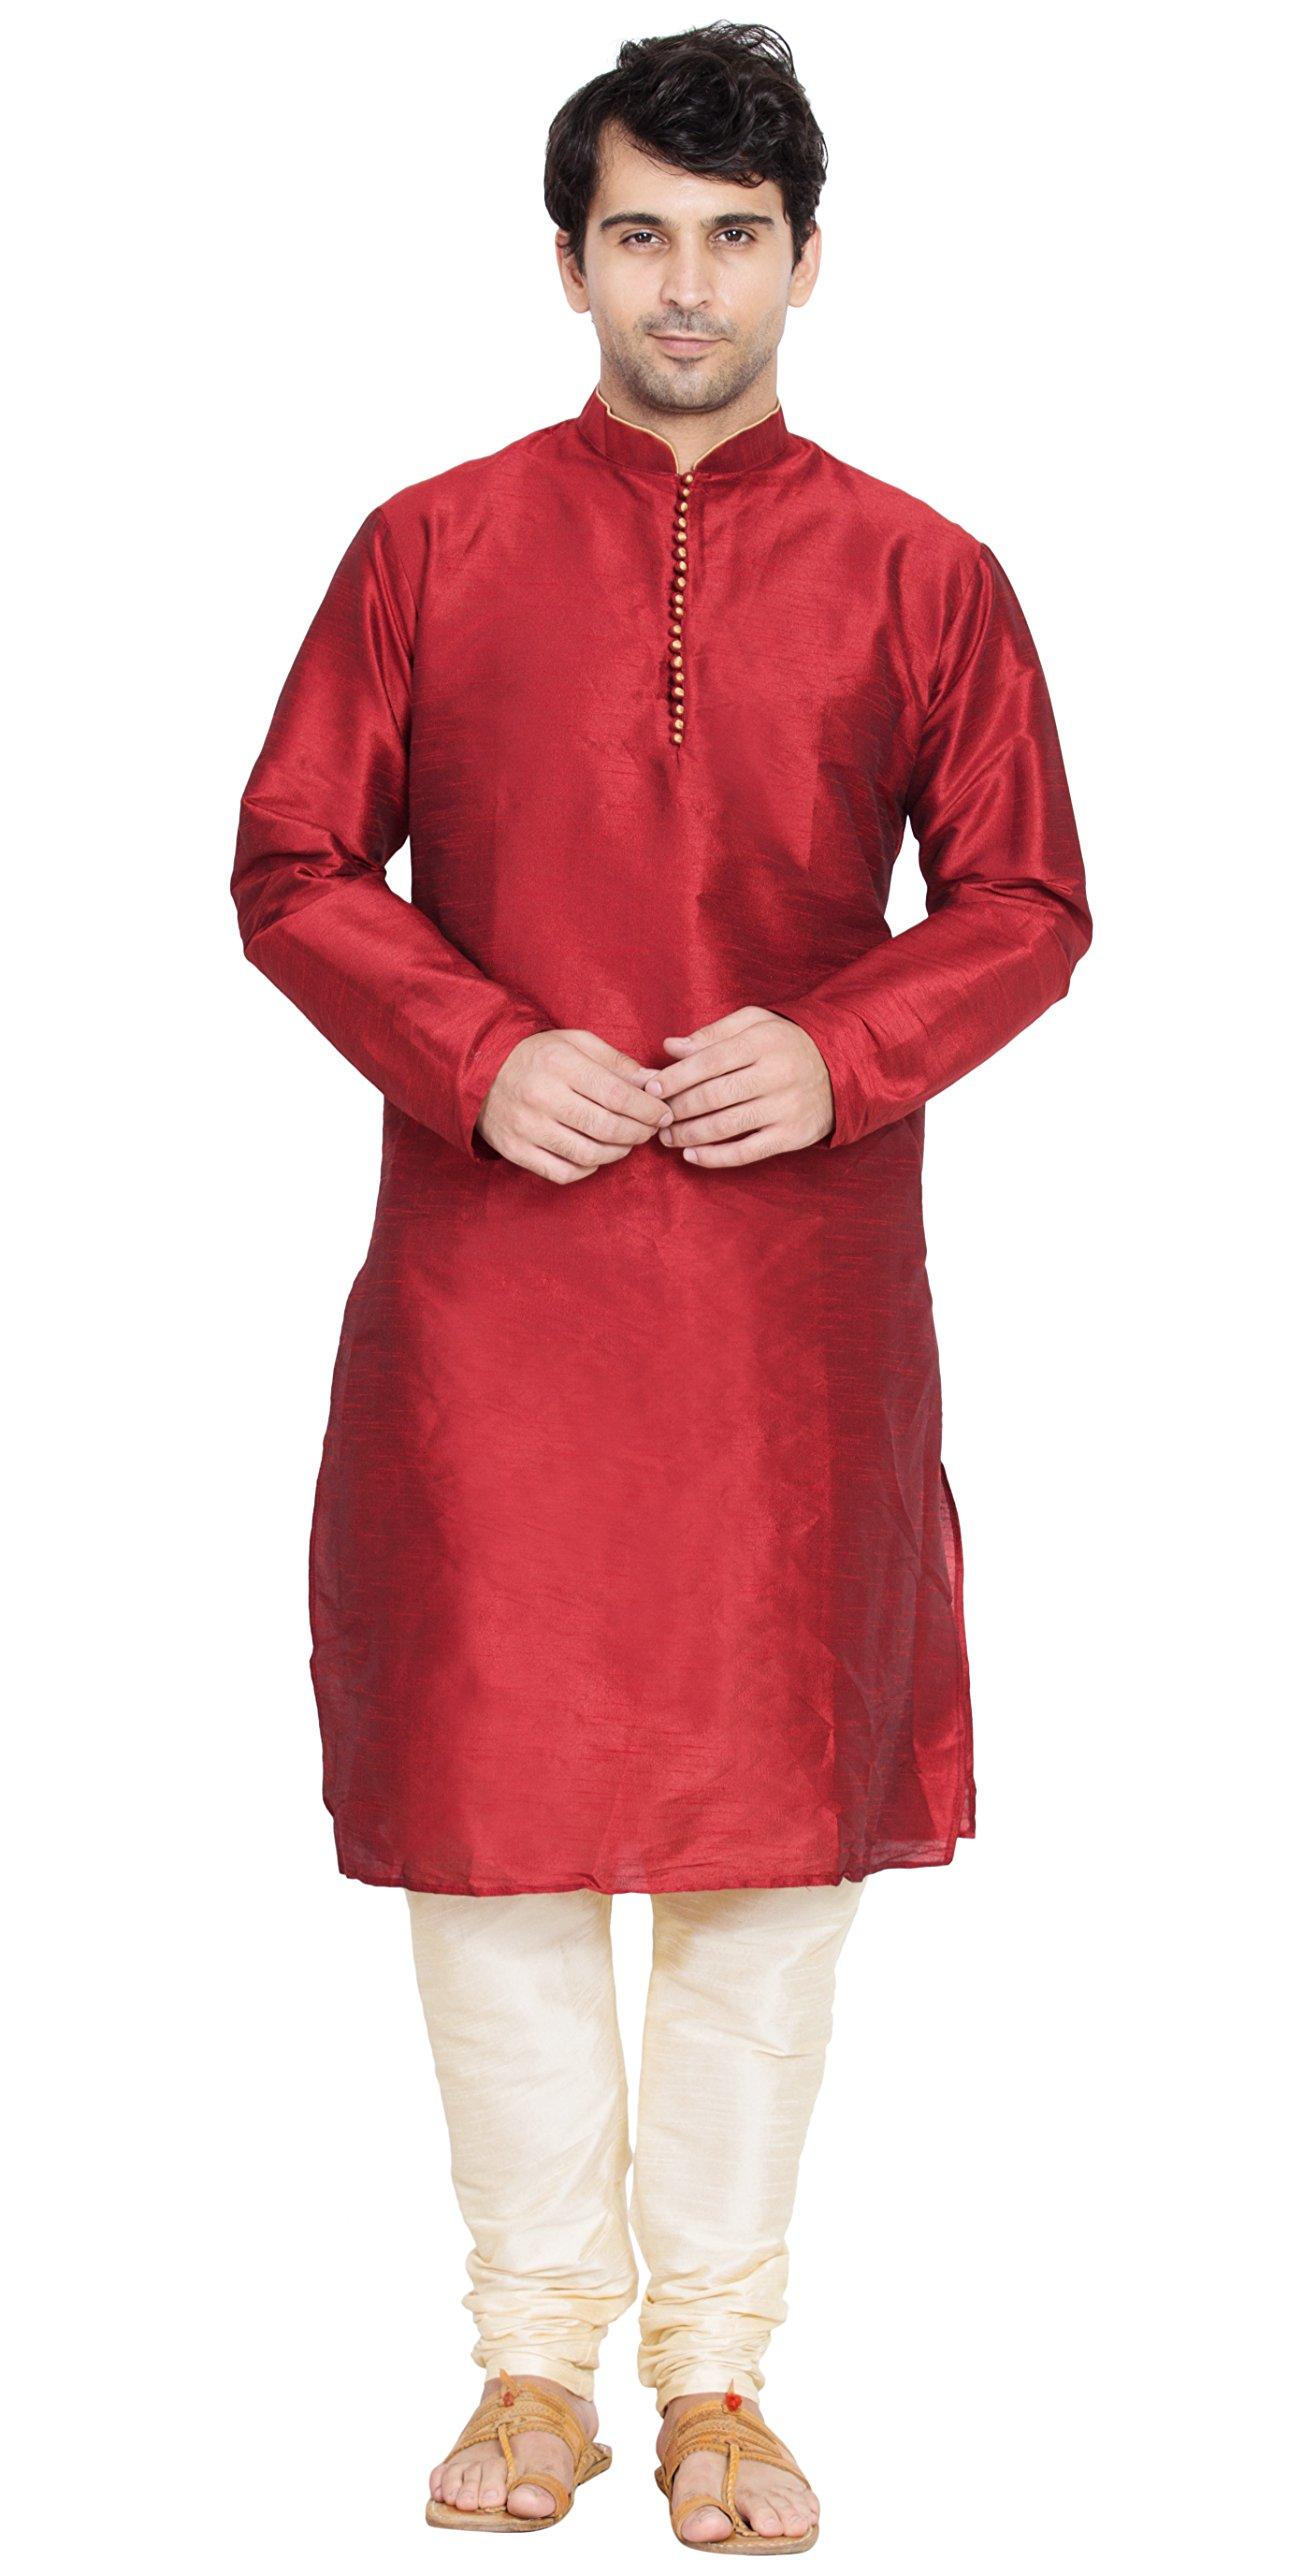 Kurta Pajama Men Indian Long Sleeve Shirt Black Designer Traditional Casual Wear Outfit -M